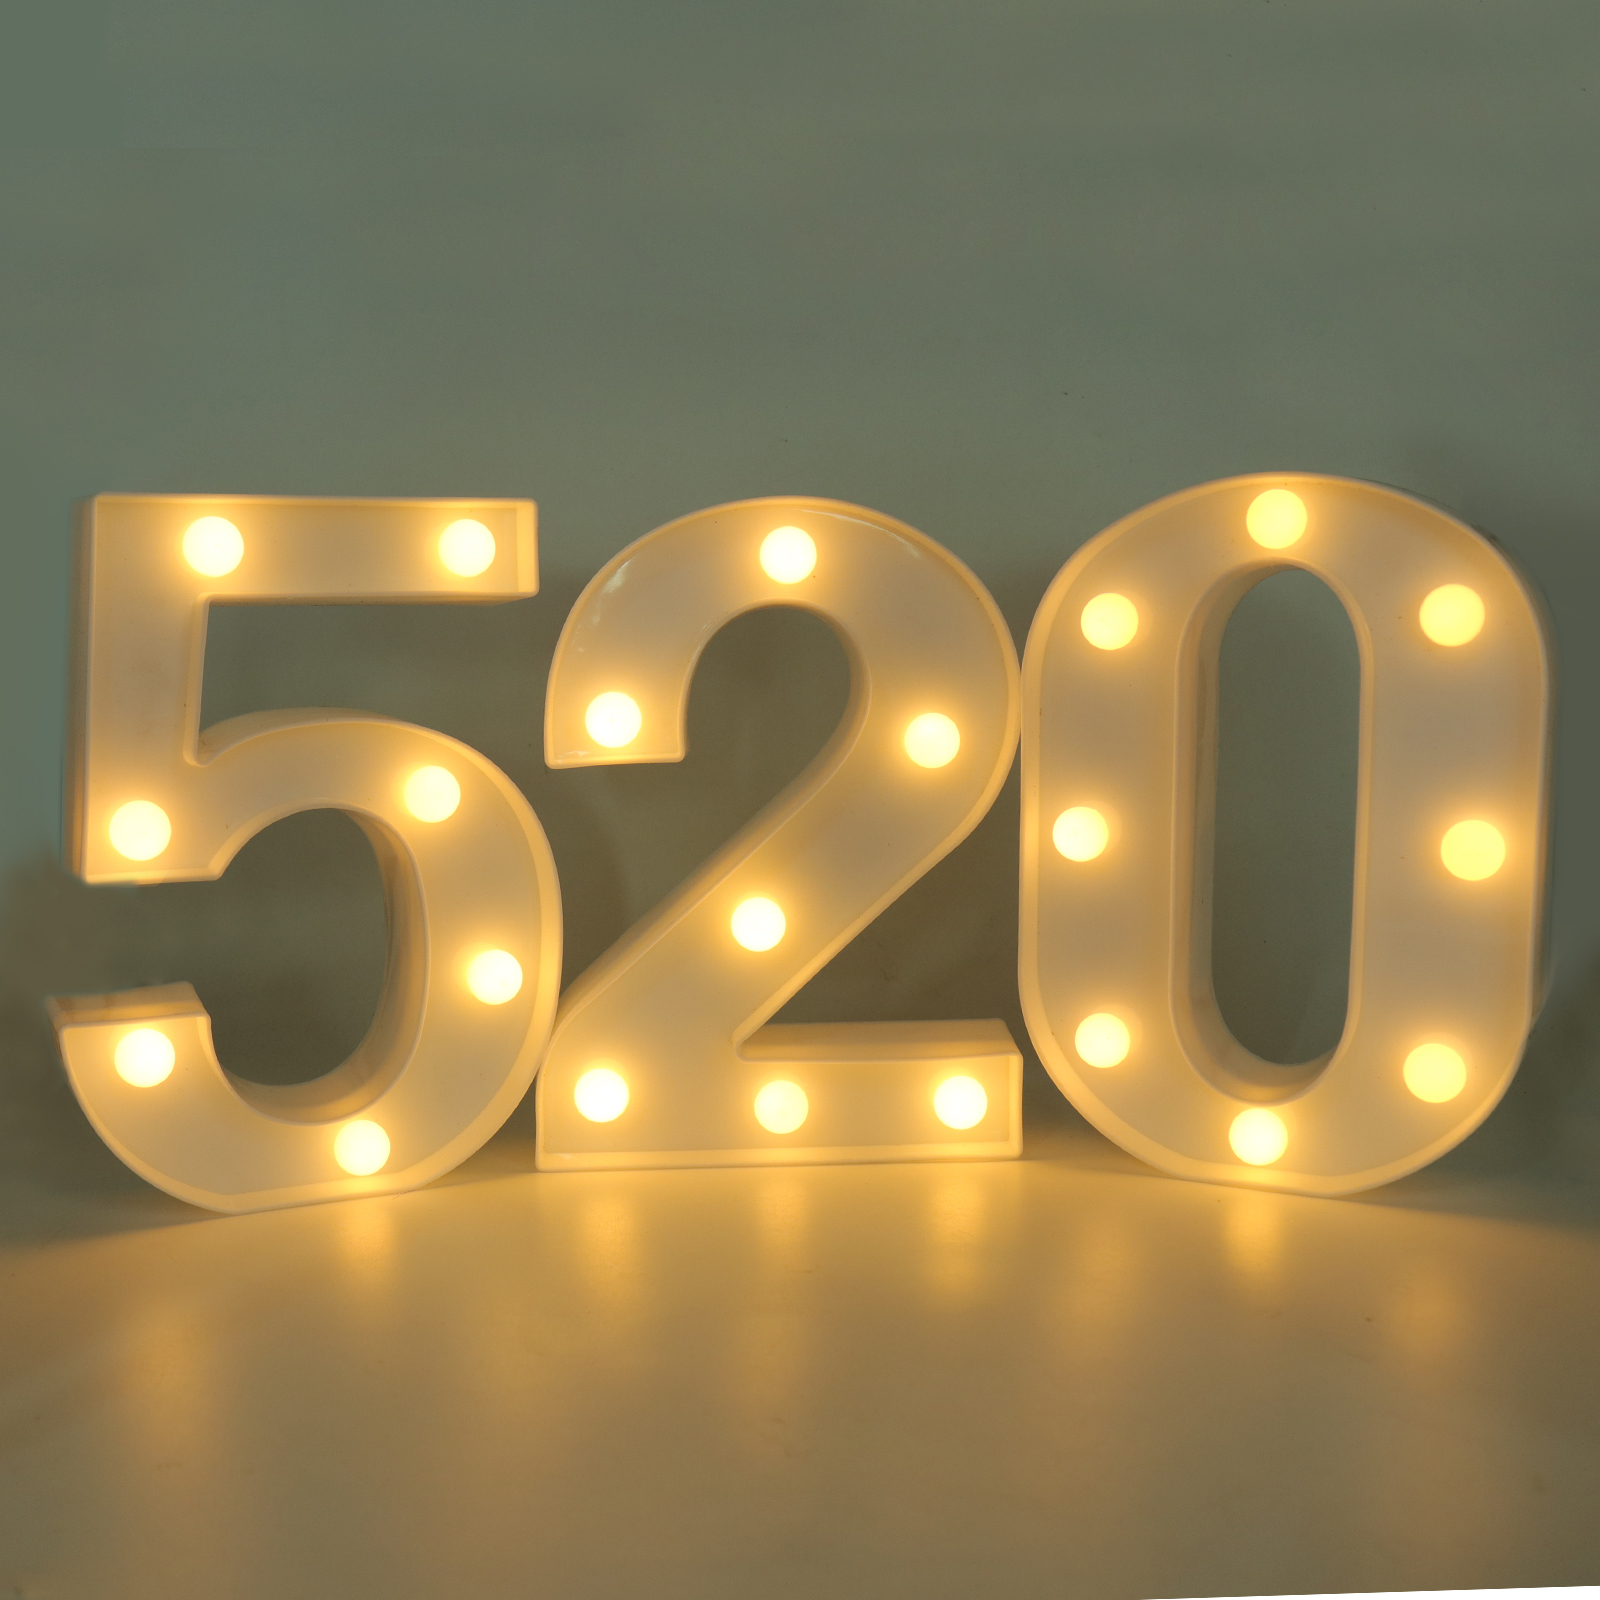 Aliexpress.com : Buy 1pcs LED Number Light Birthday Party